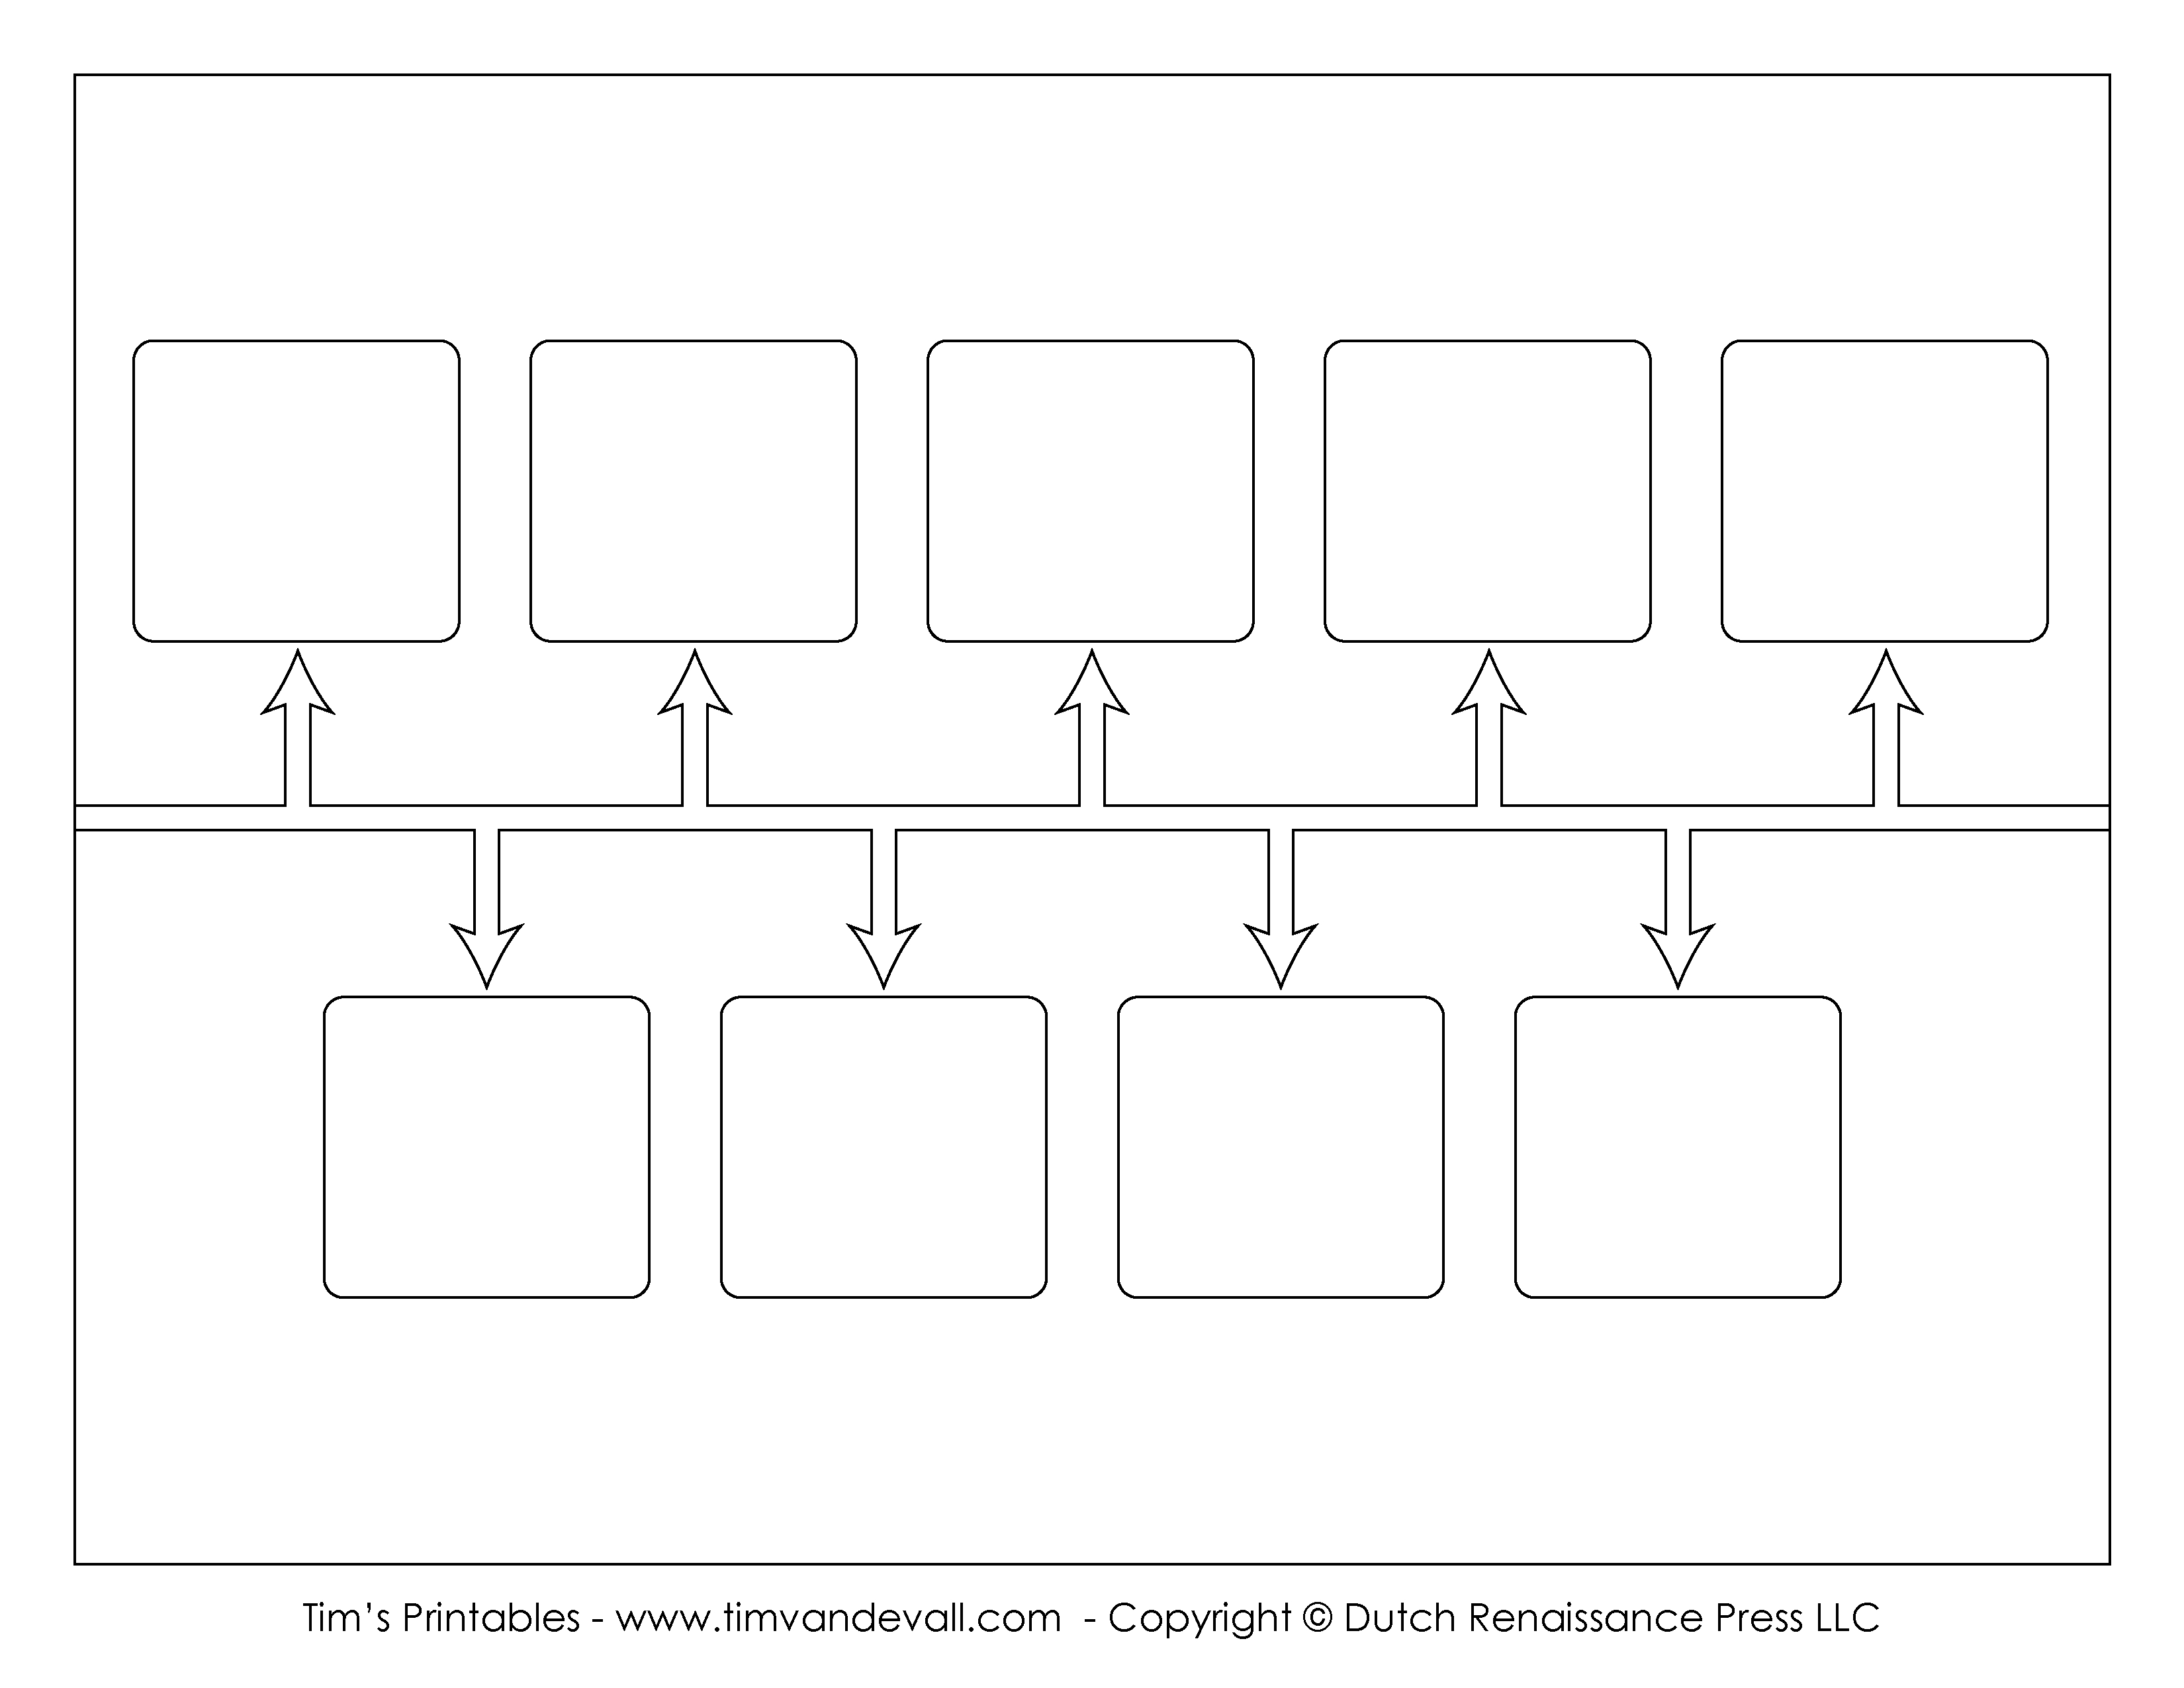 Blank Timeline Template - Tim's Printables - Free Blank Timeline Template Printable